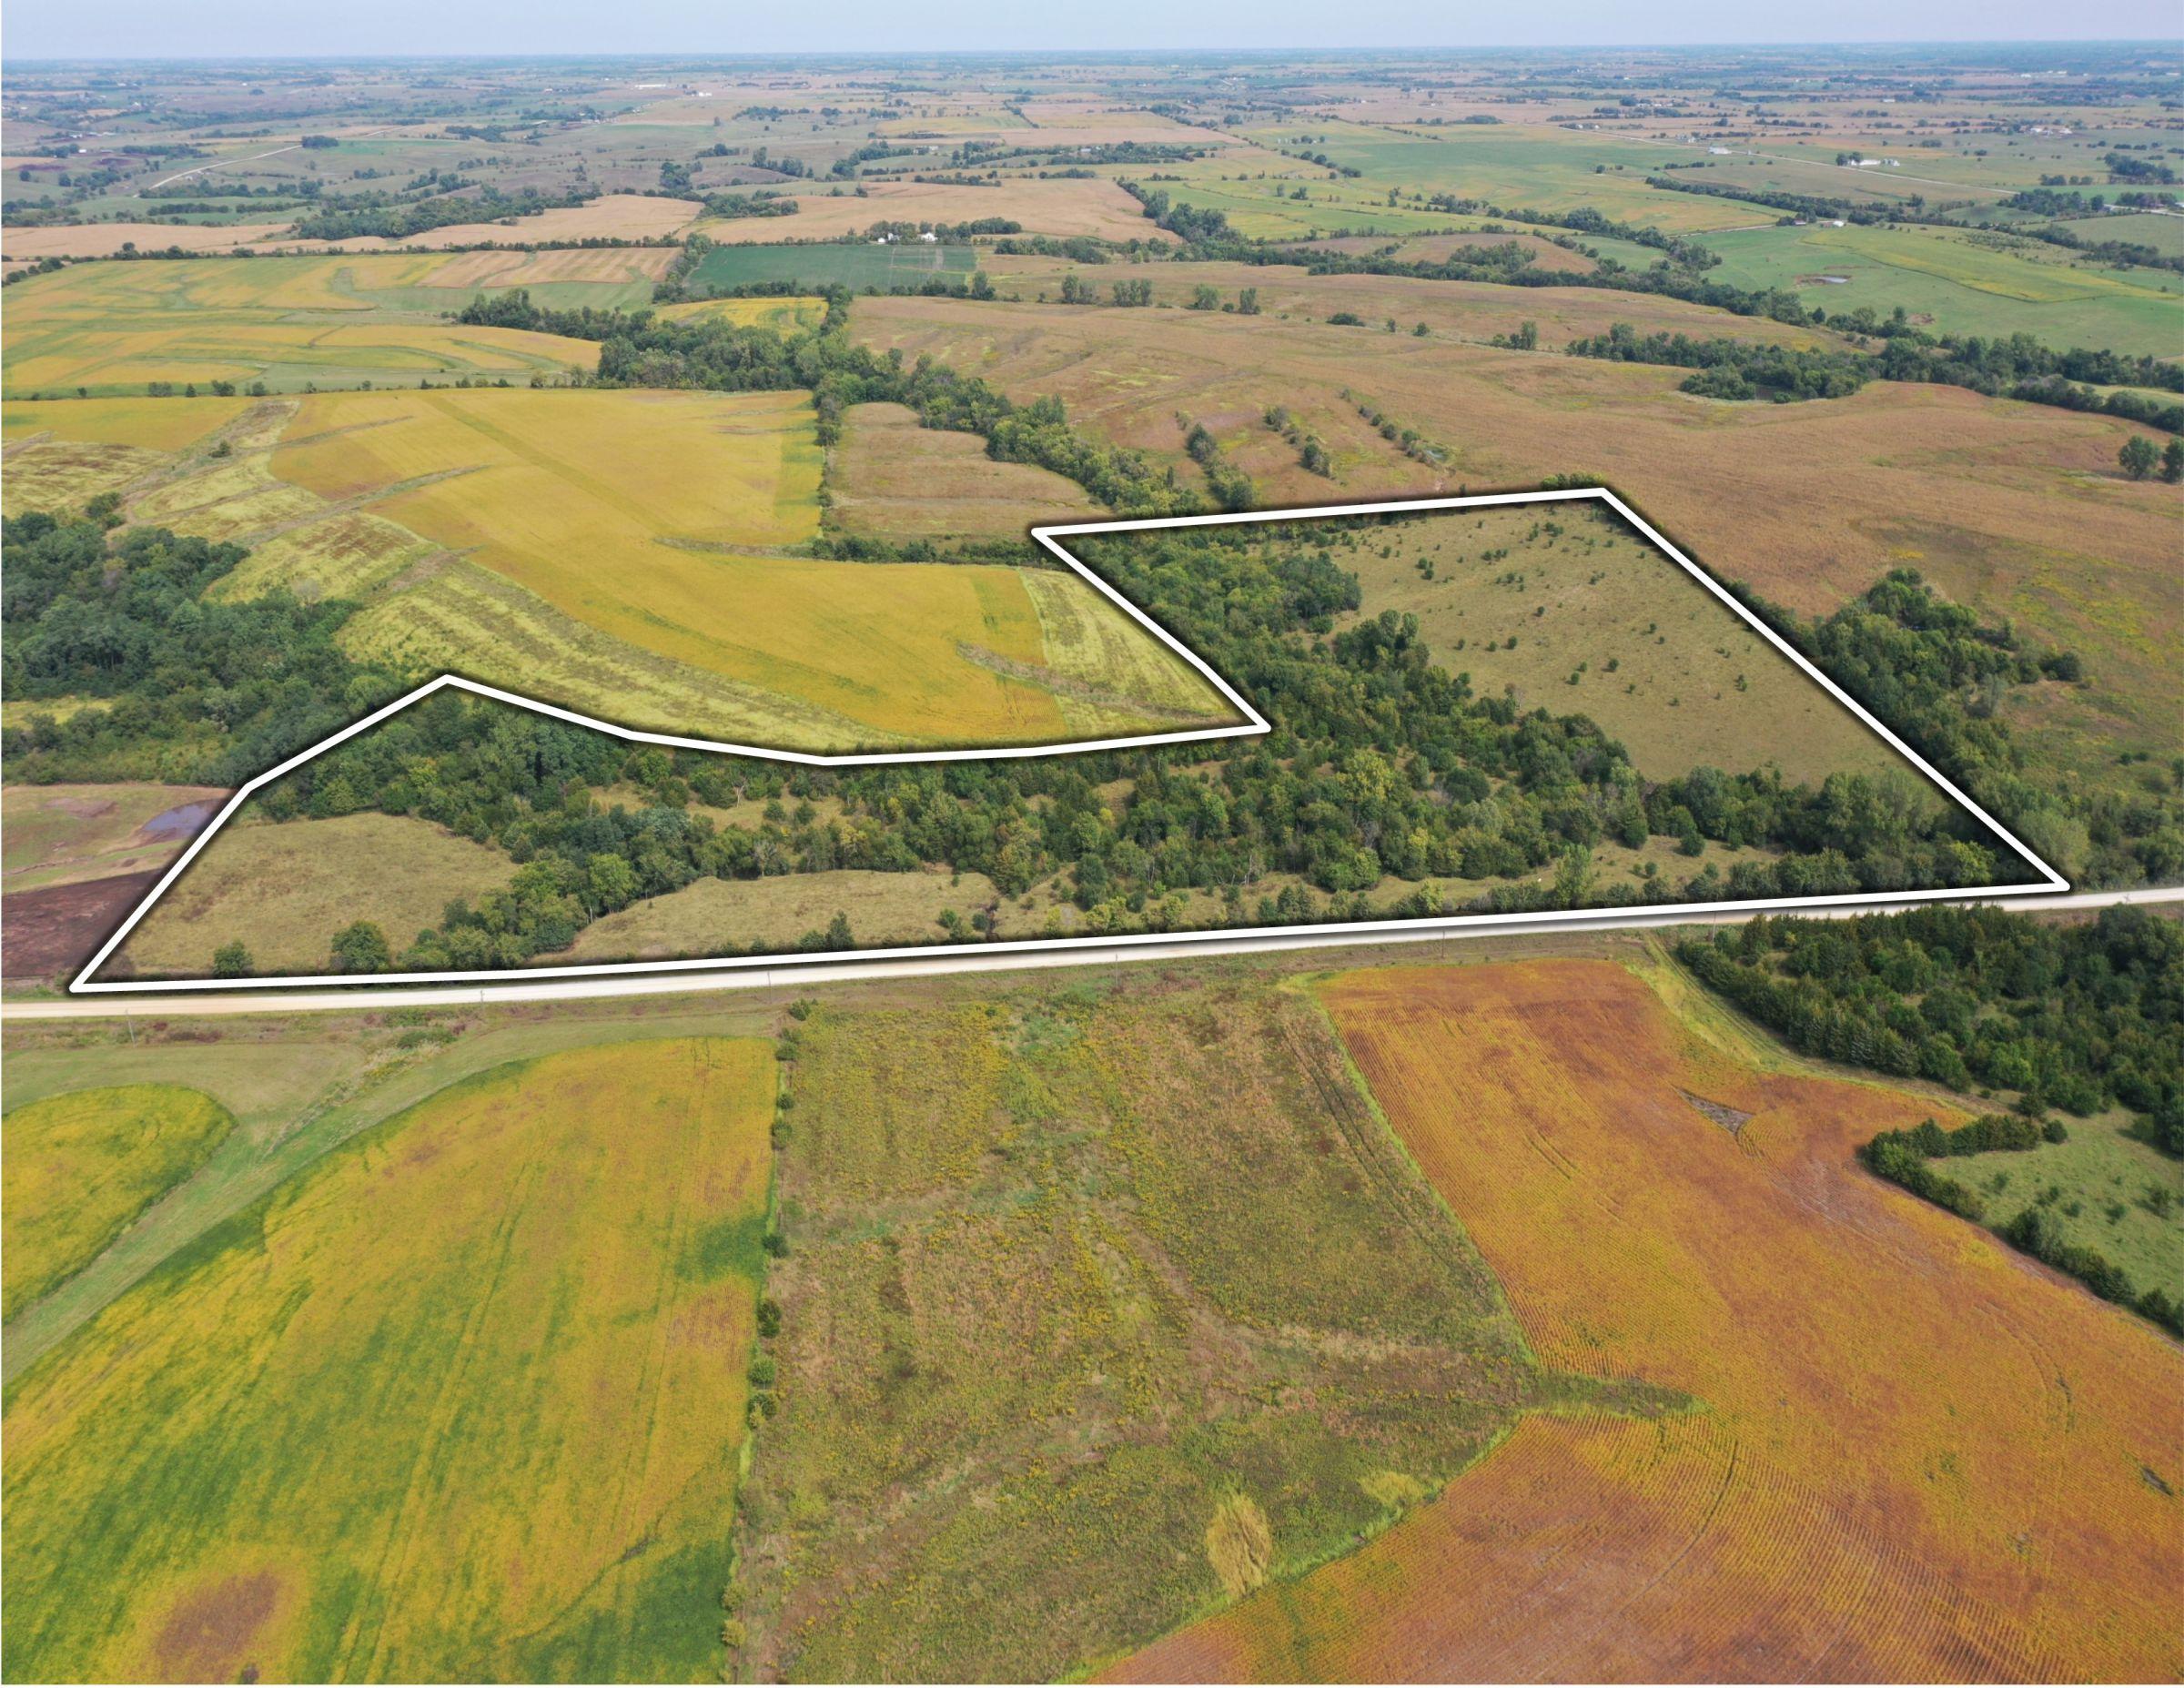 clarke-county-iowa-37-acres-listing-number-15398-2-2021-03-08-145915.jpg